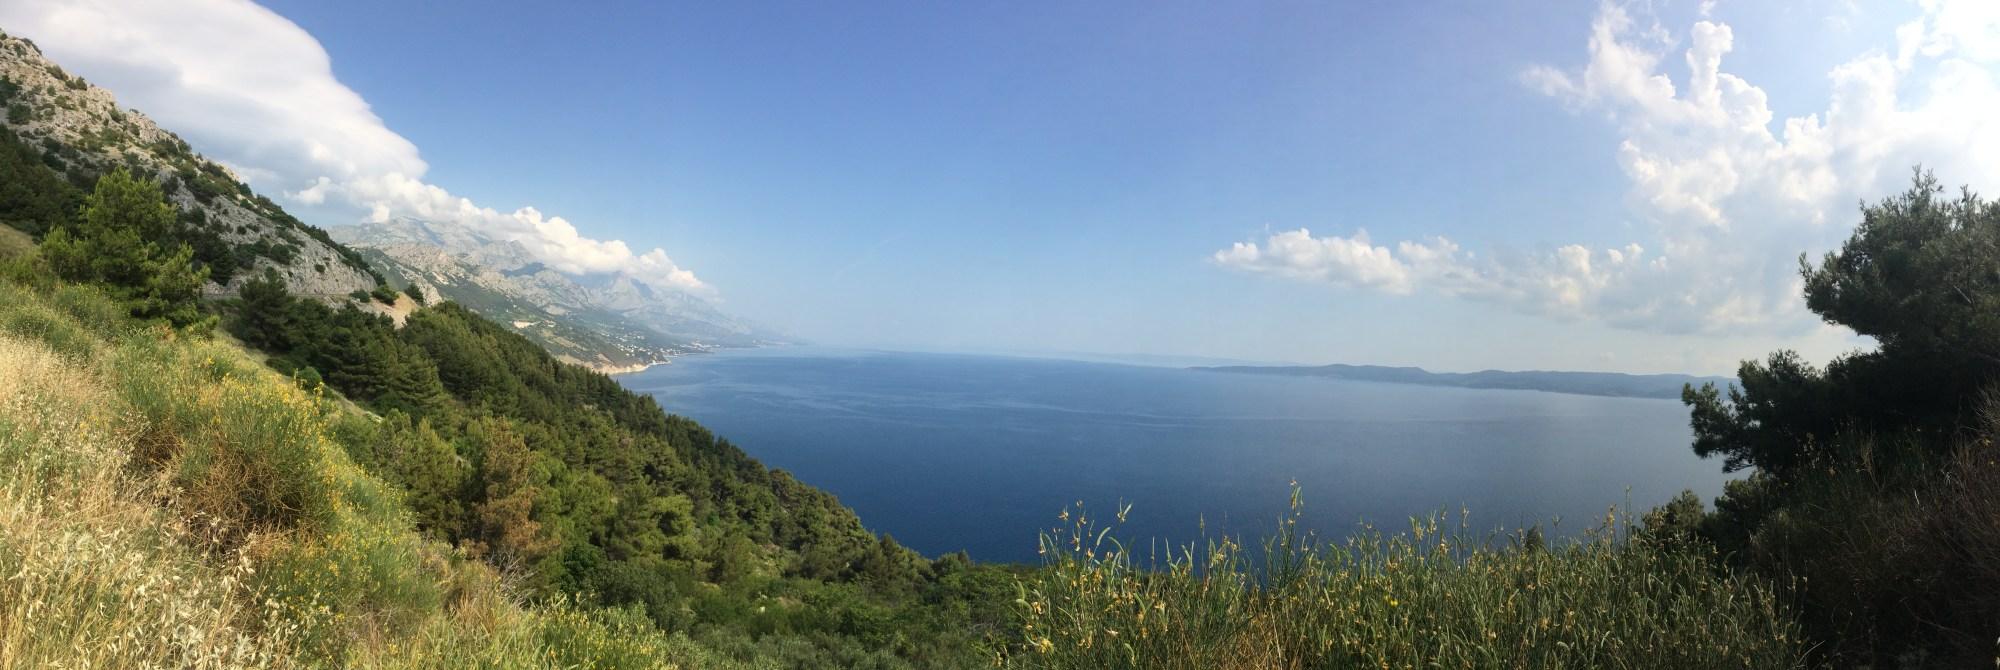 Croatian coastal pano